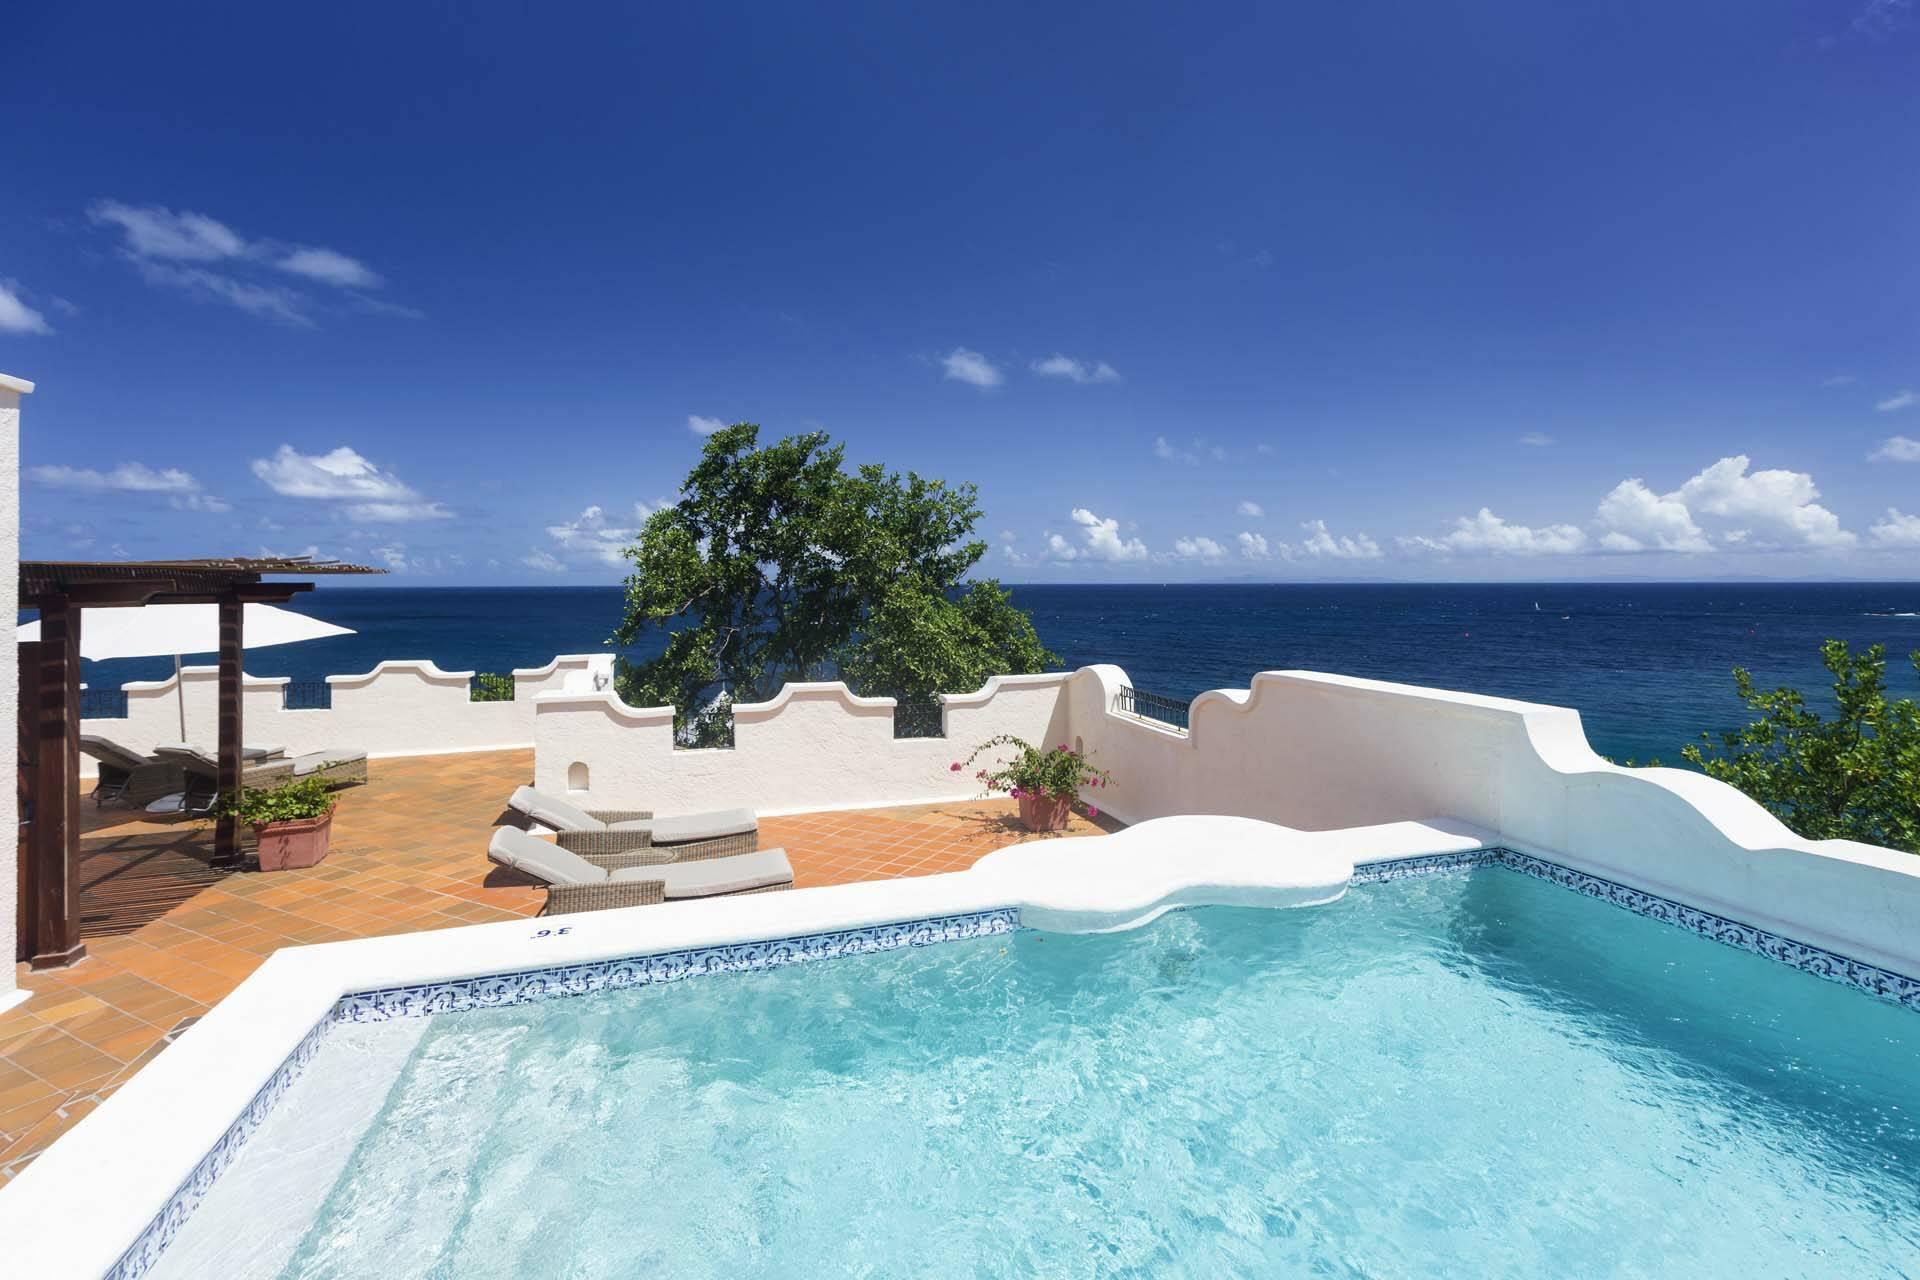 Cap Maison Ocean View Villa Suite Piscine Terrasse Sainte Lucie